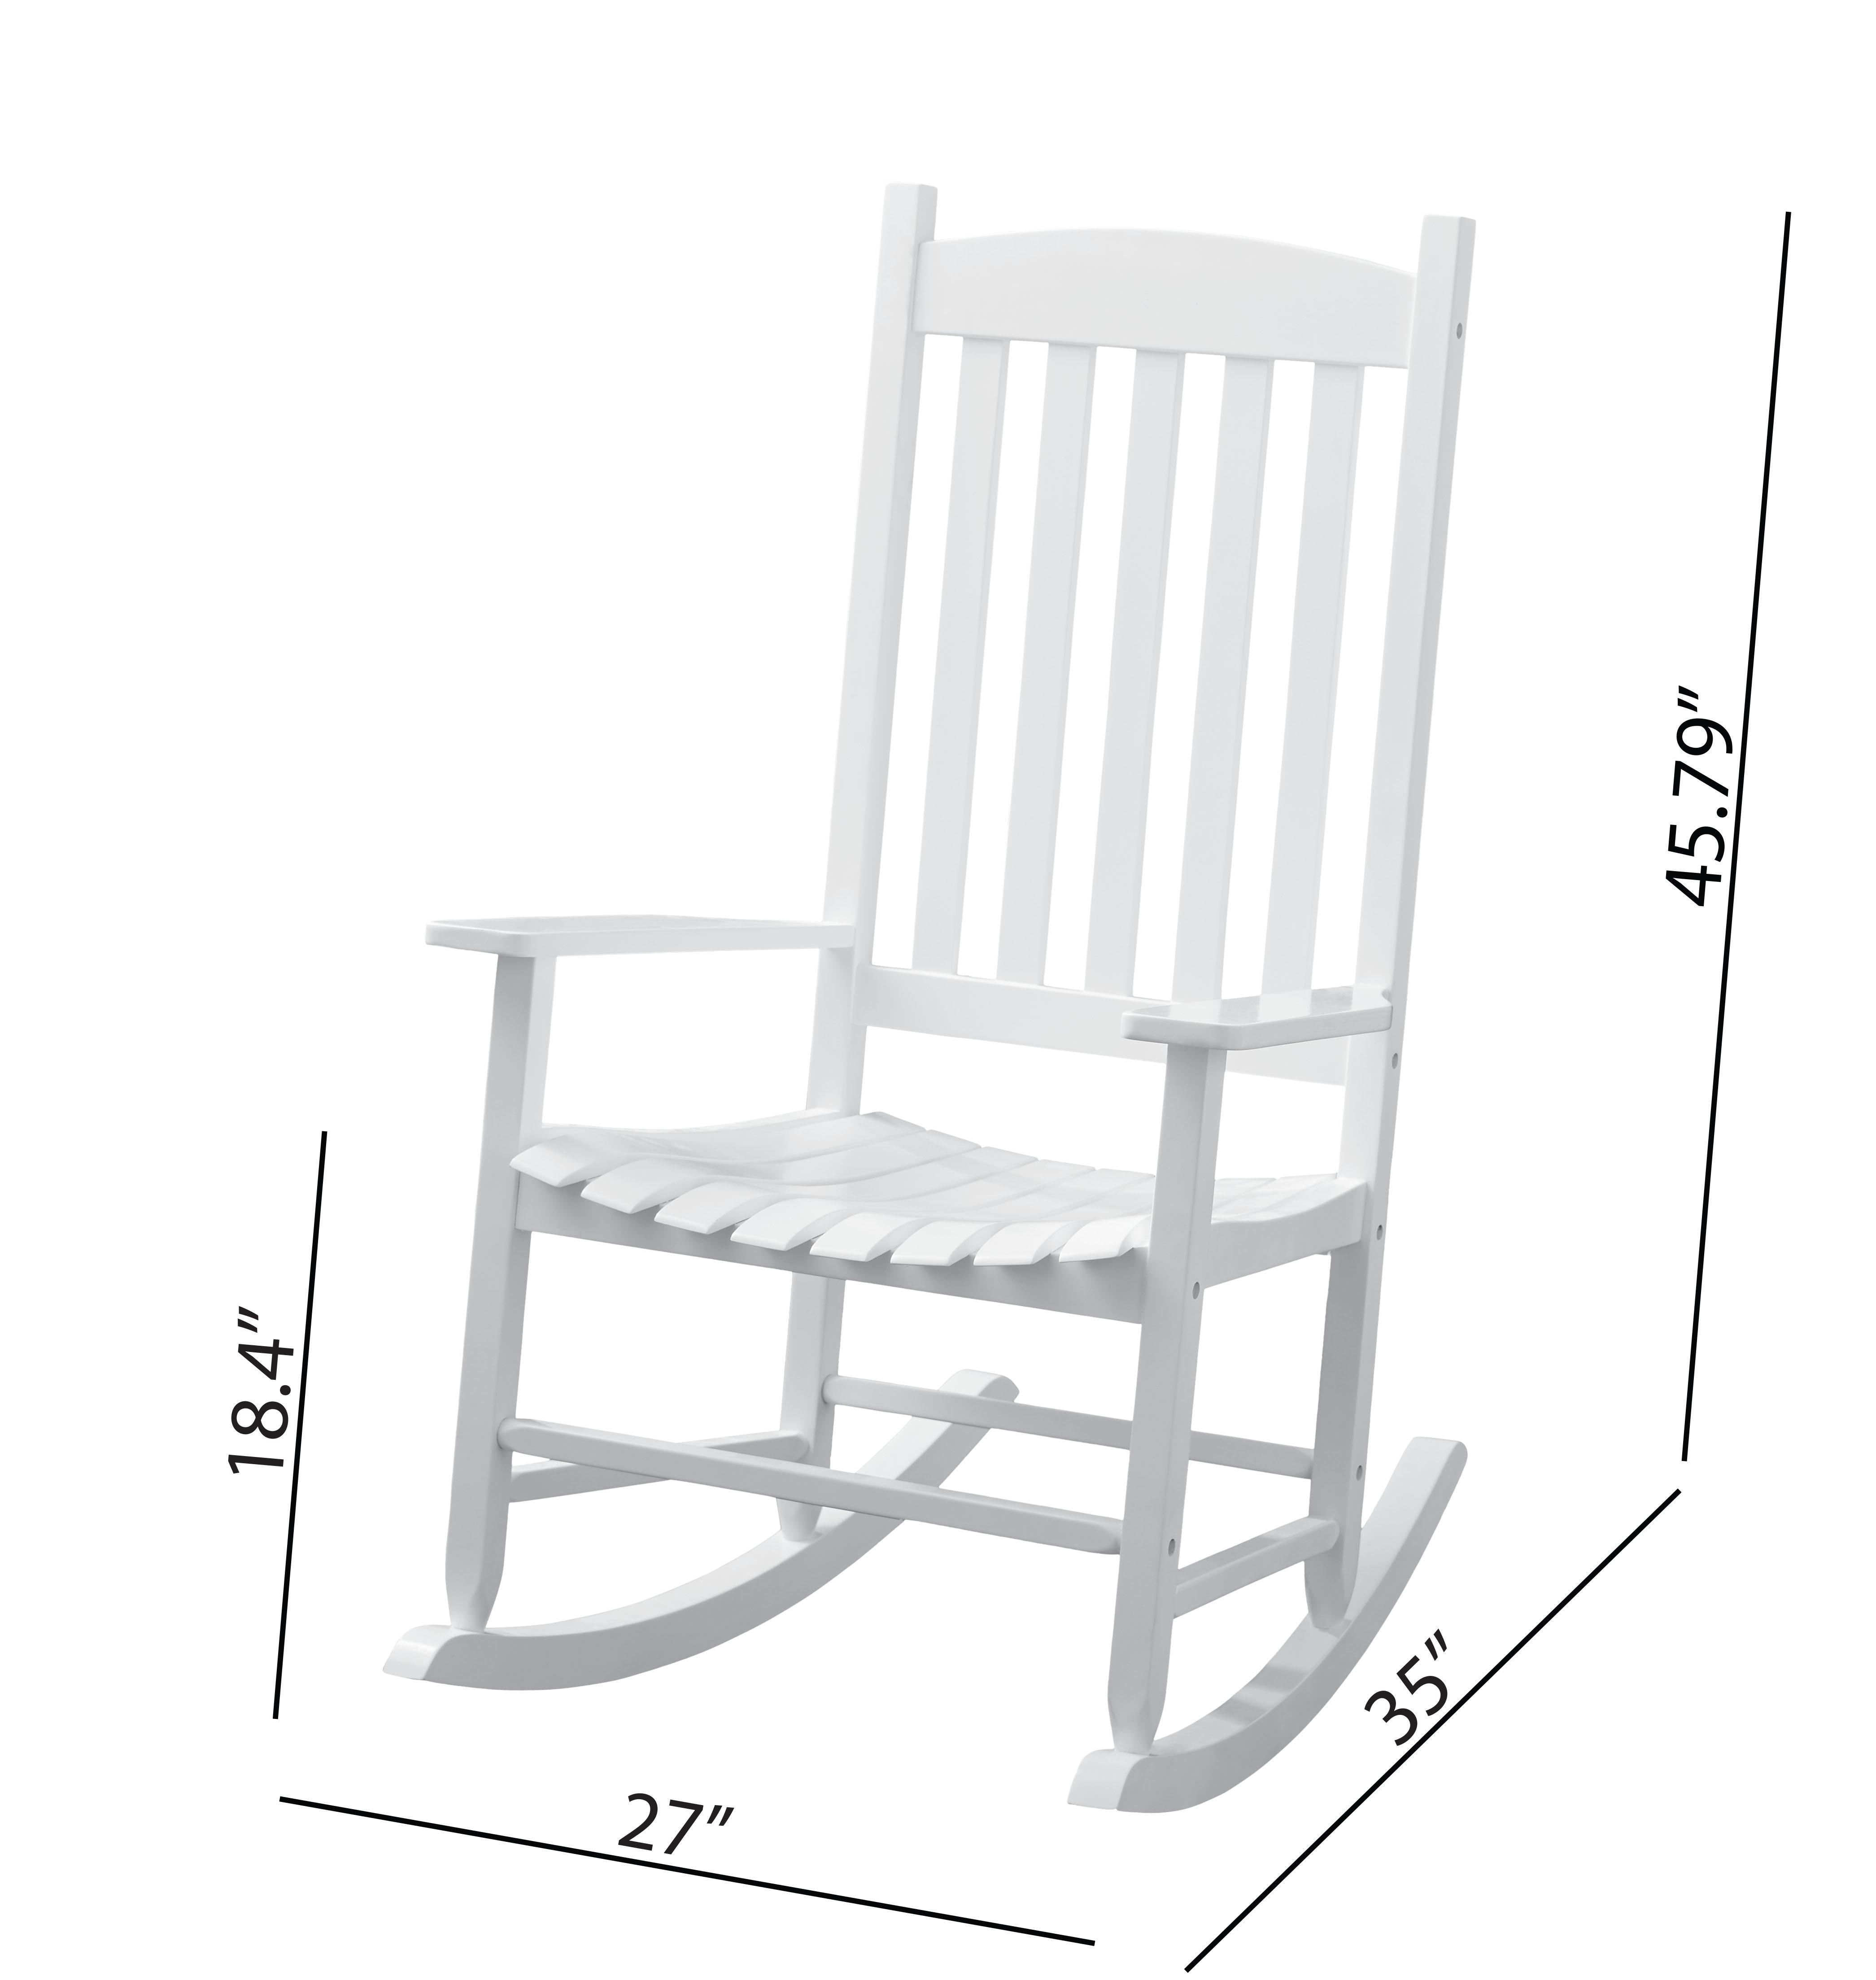 Mainstays Outdoor Wood Slat Rocking Chair White Walmart Com Walmart Com